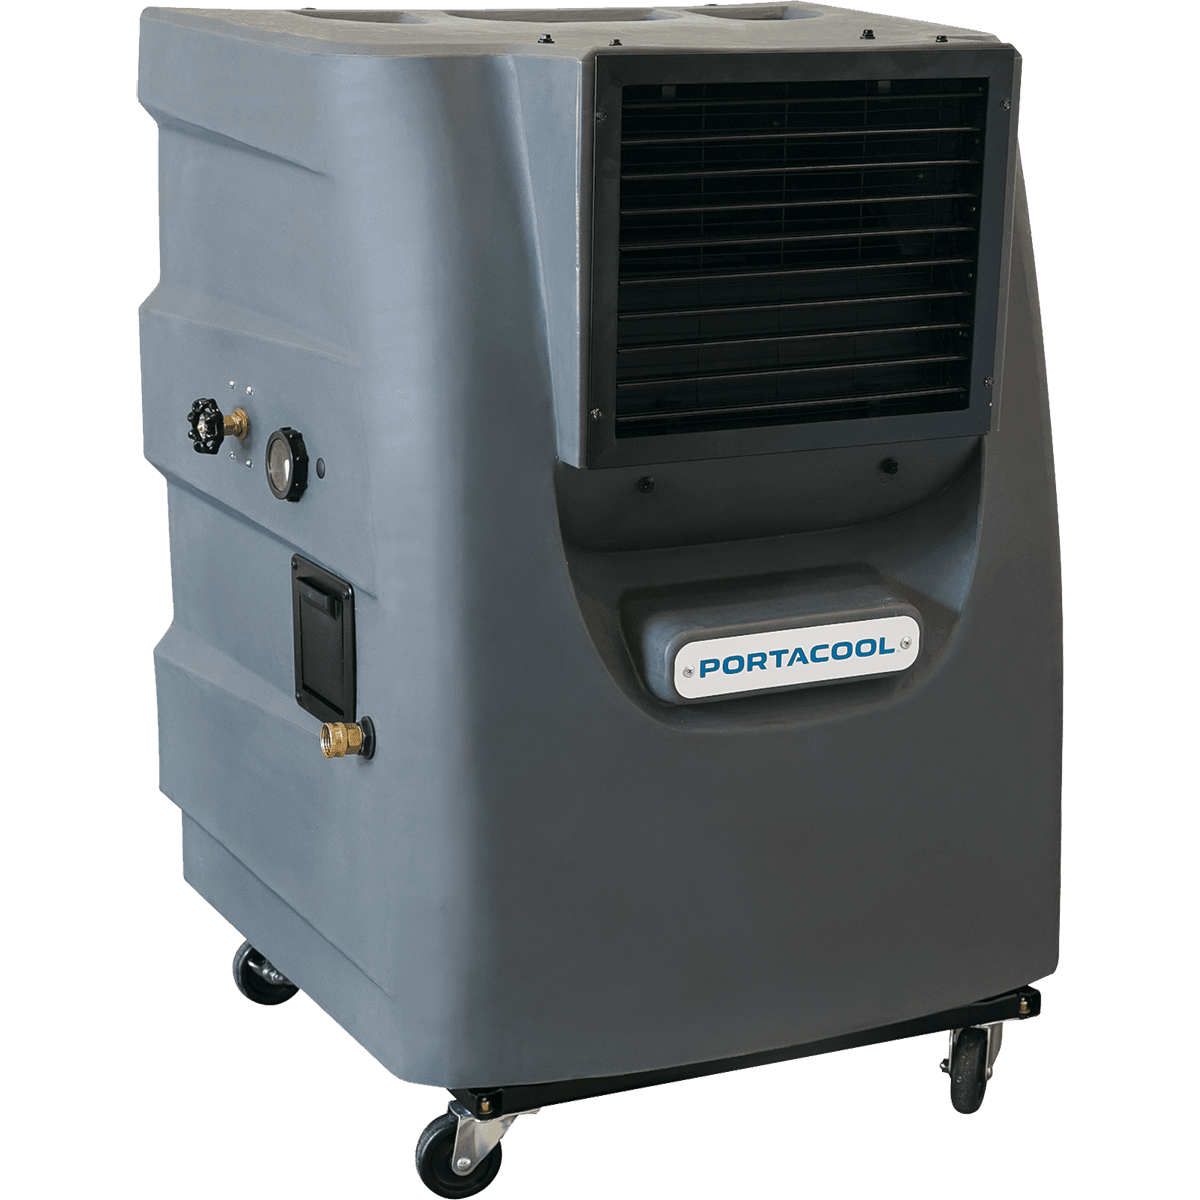 Portable Evaporative Coolers : Portacool cyclone portable evaporative cooler sylvane